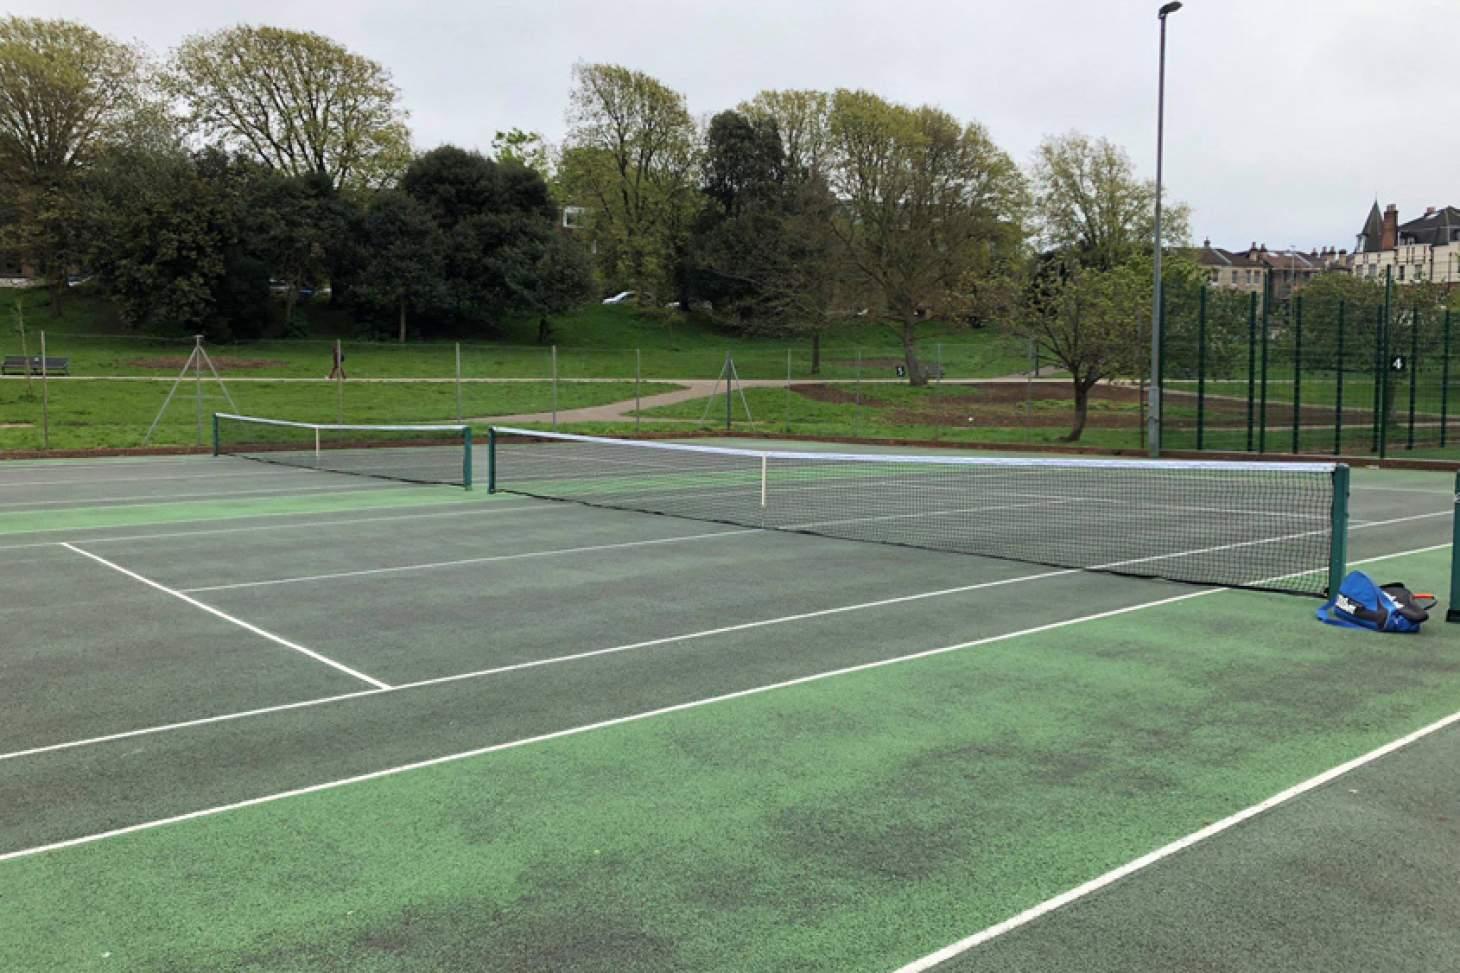 Queens Park Tennis Cub Outdoor   Hard (macadam) tennis court